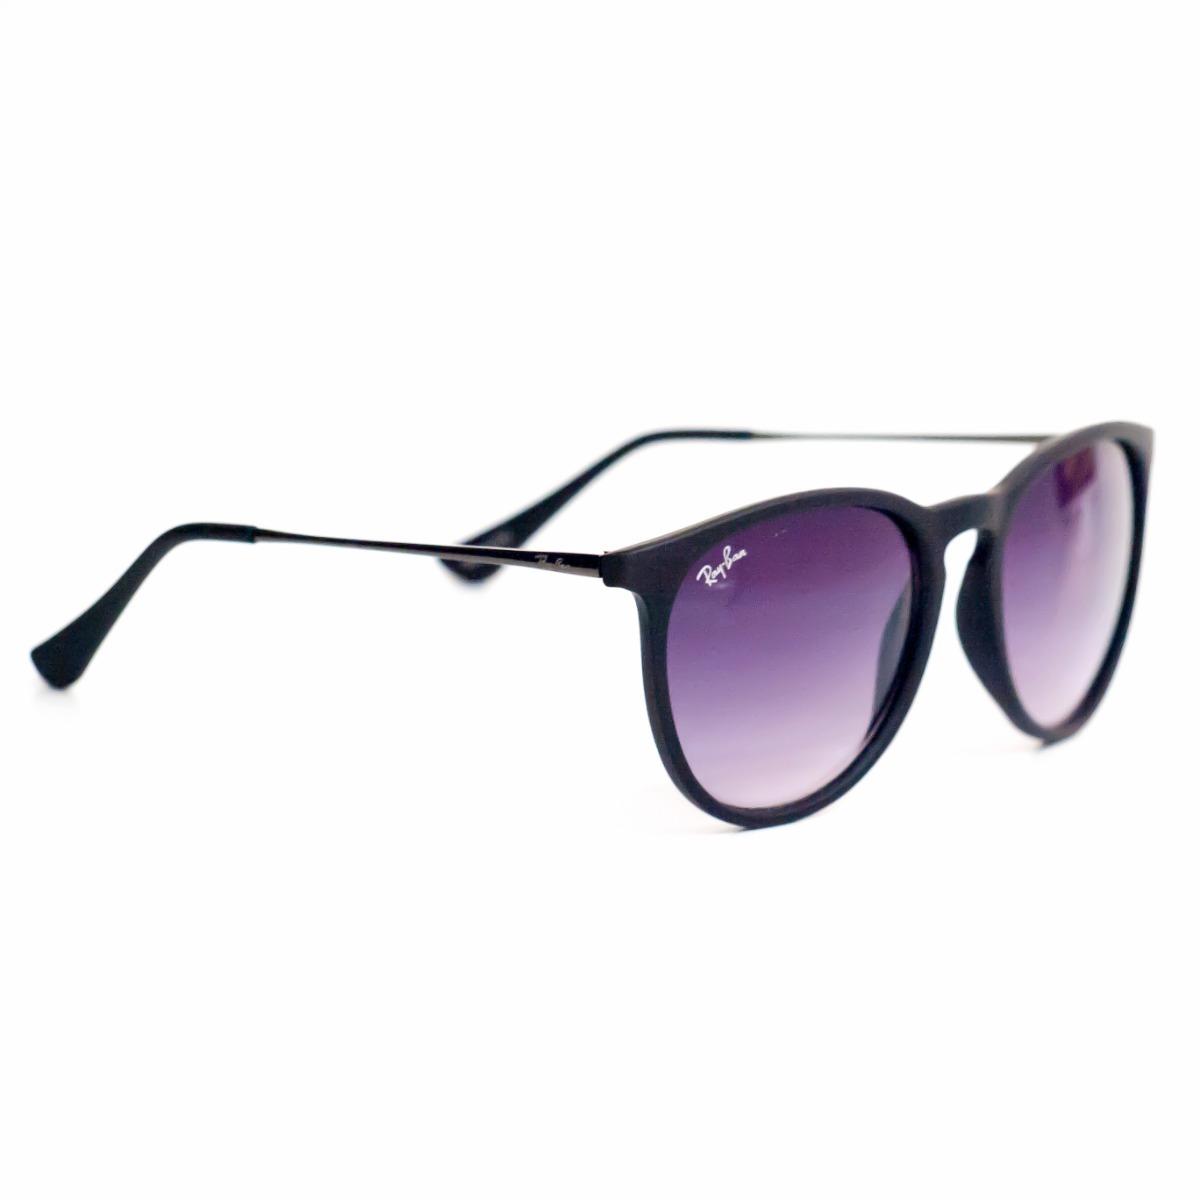 2ac5eff341 gafas de sol rayban chris erika lentes espejo uv400 +accesor. Cargando zoom.